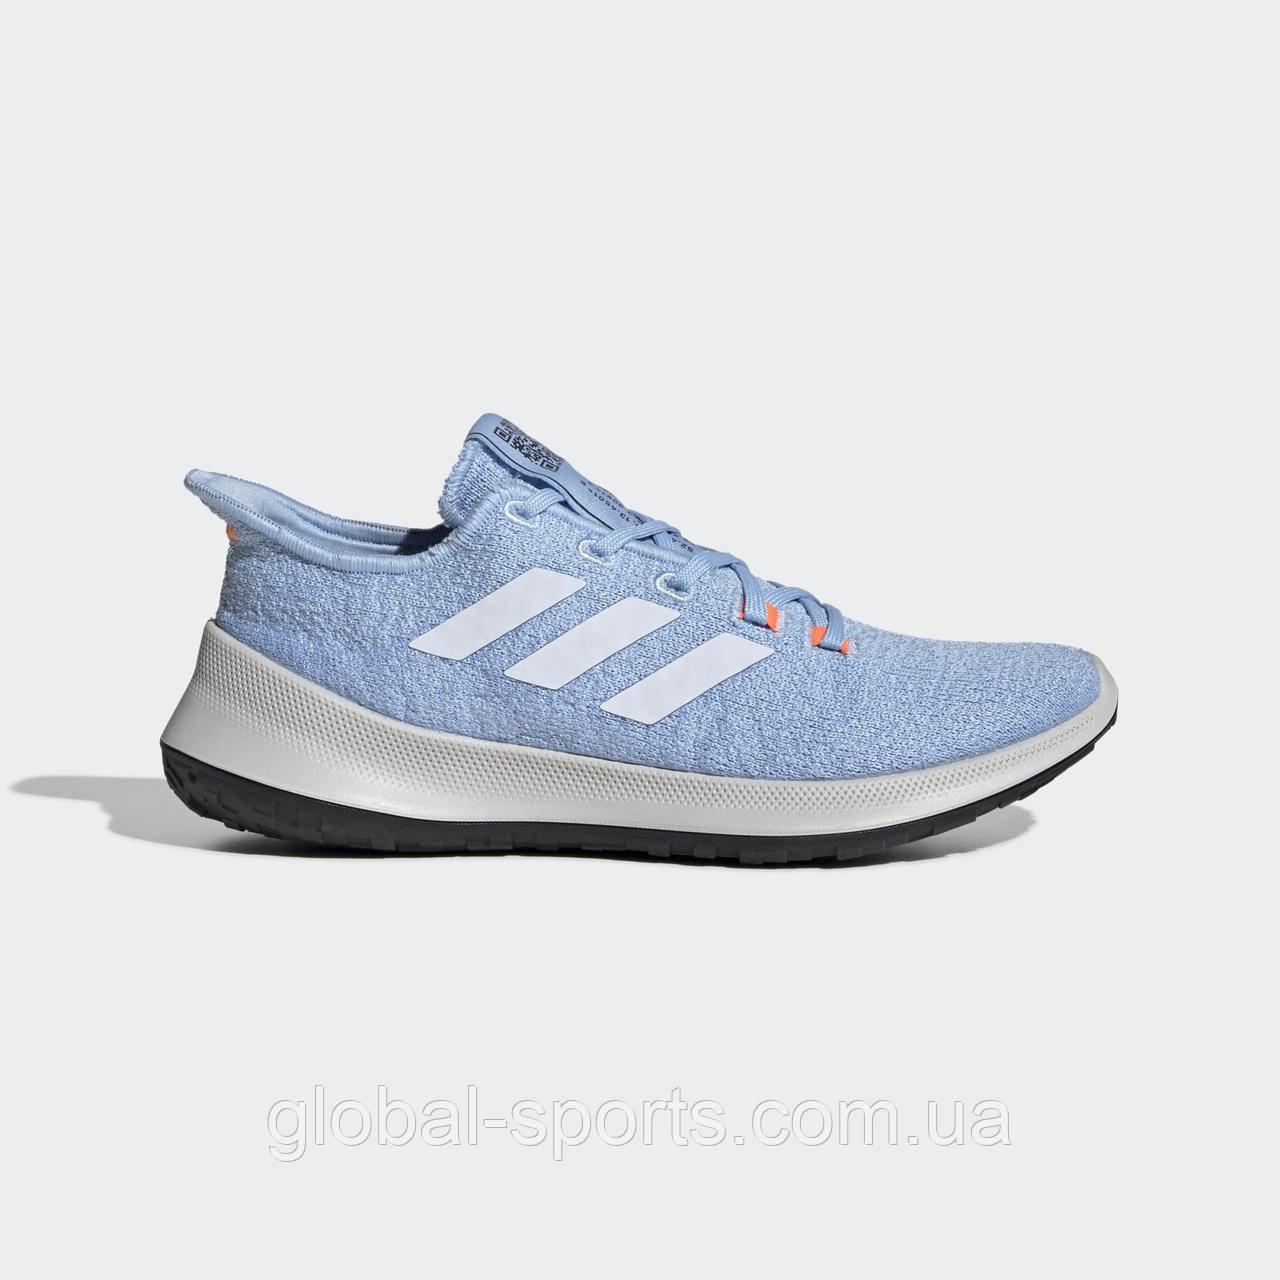 Женские кроссовки Adidas SenseBOUNCE plus W(Артикул:G27383)